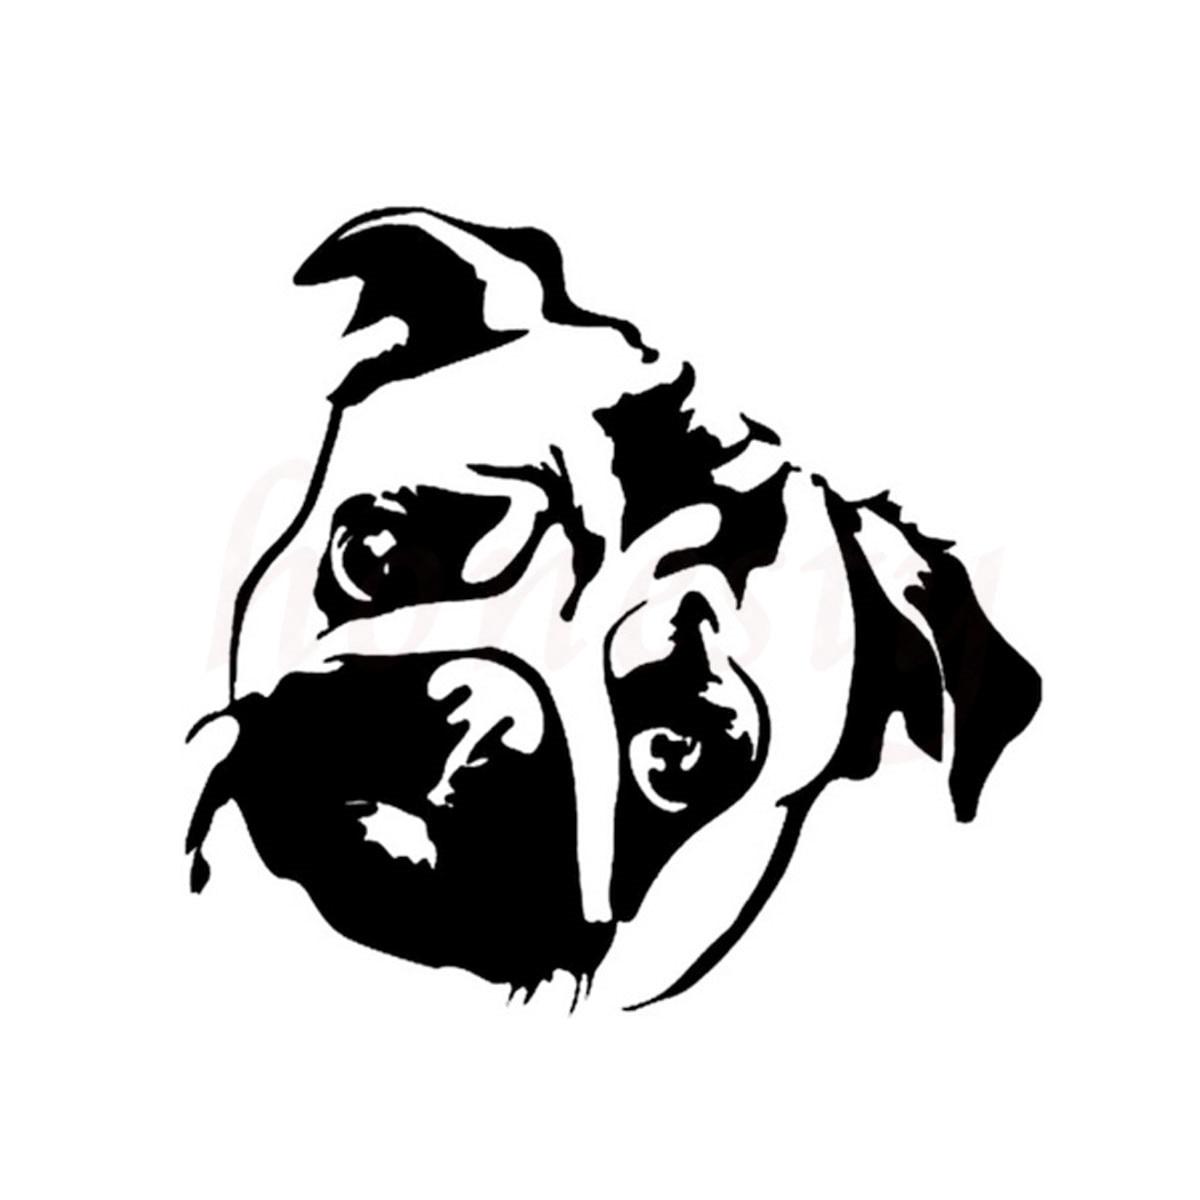 Car glass sticker design - Cute Pug Dog Animal Car Sticker Wall Home Glass Window Door Laptop Auto Truck Motorcycle Black